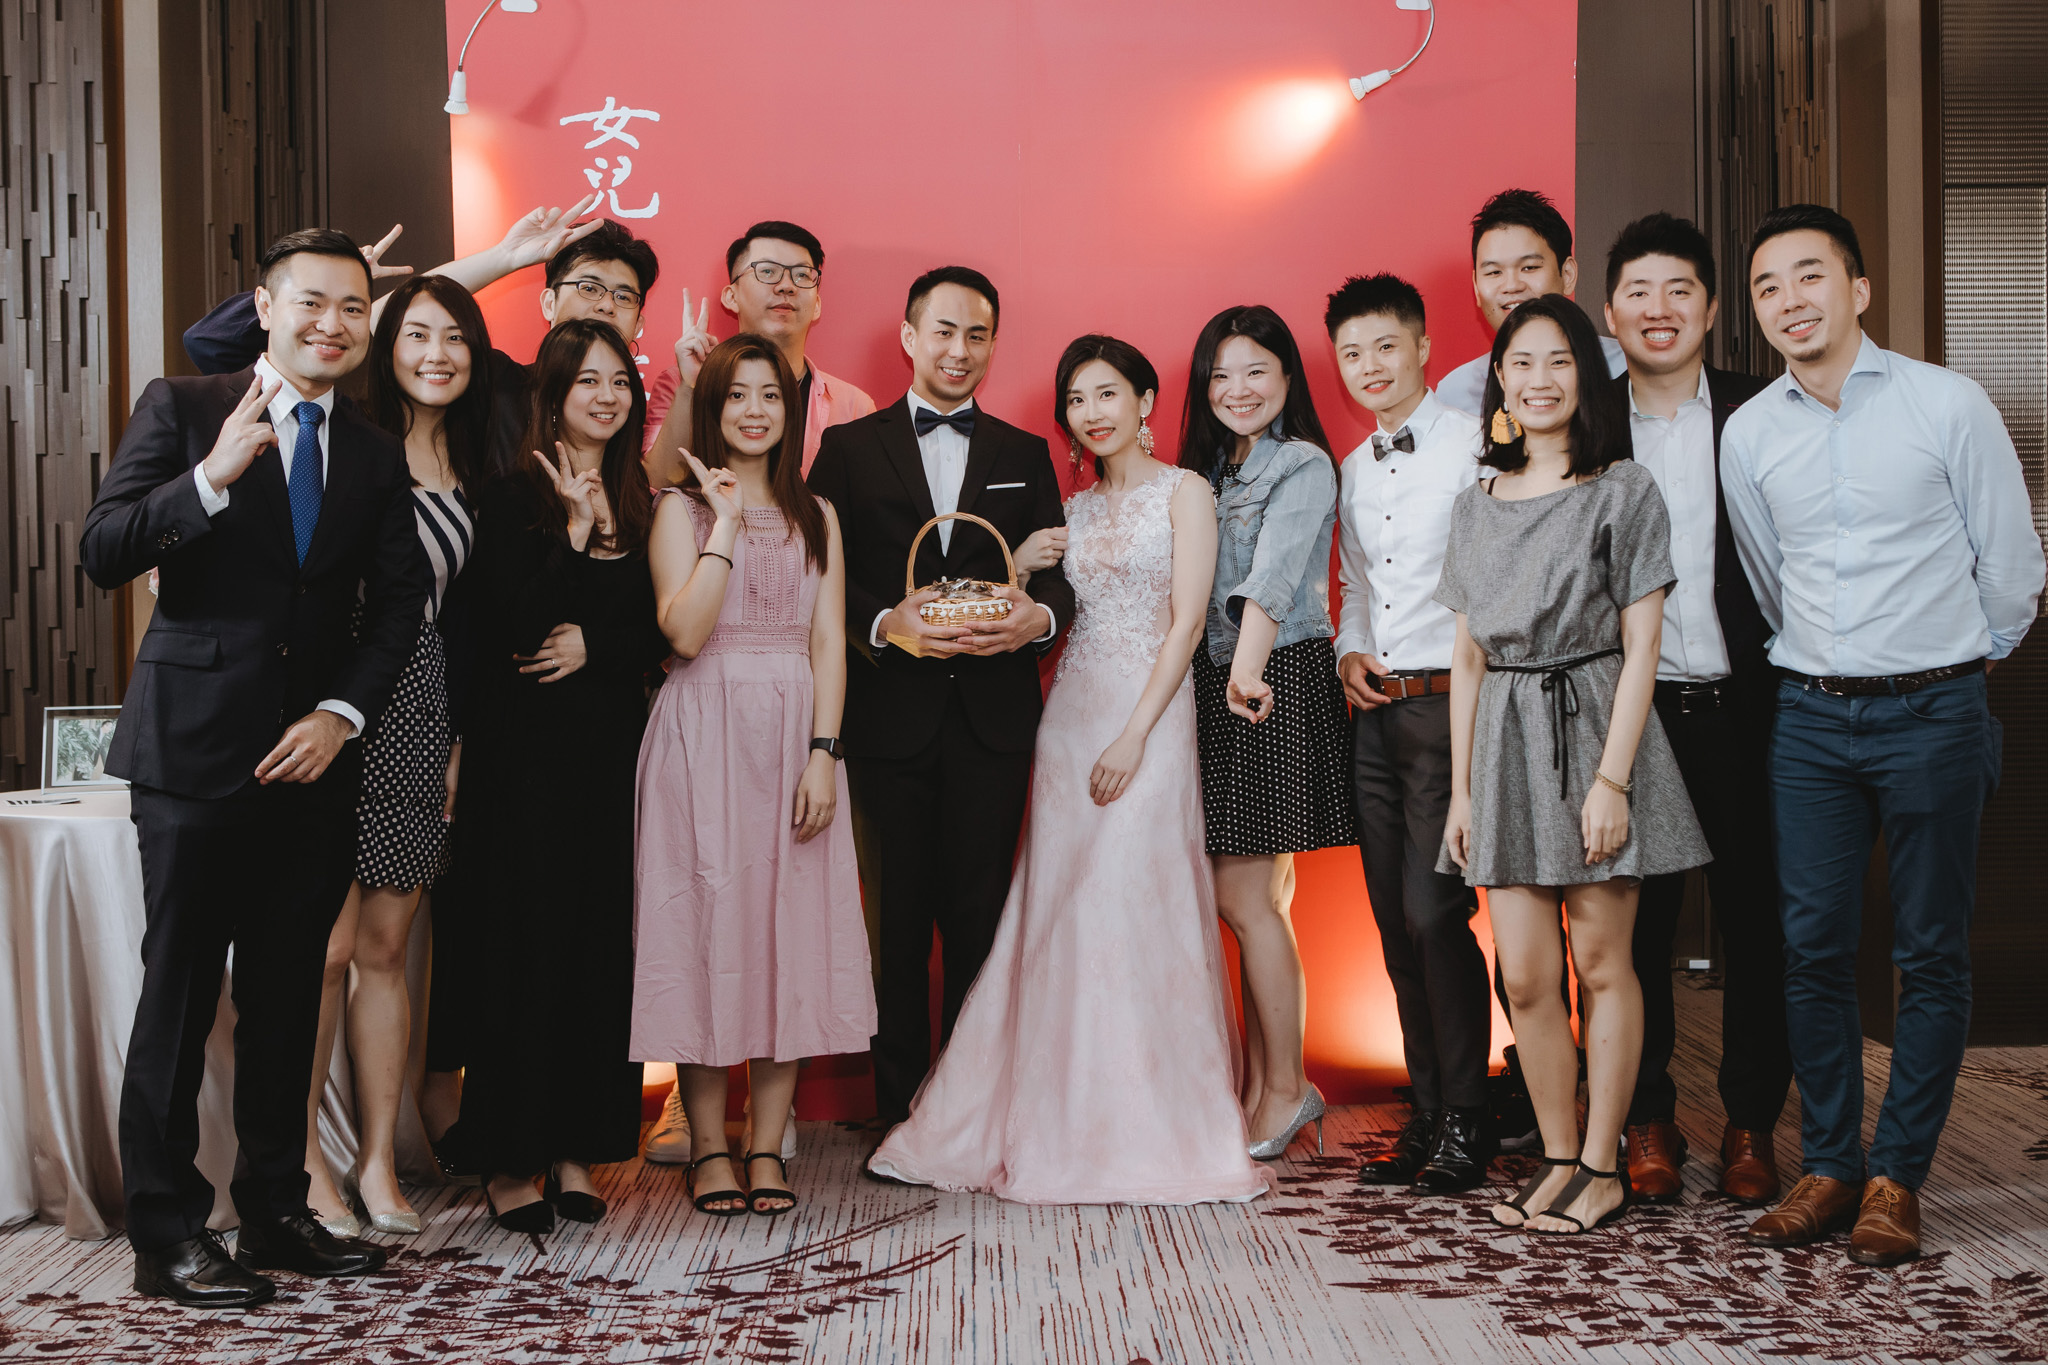 EW 居米 台北禮服 台北婚紗 台北婚攝 國泰萬怡 台北婚禮-37